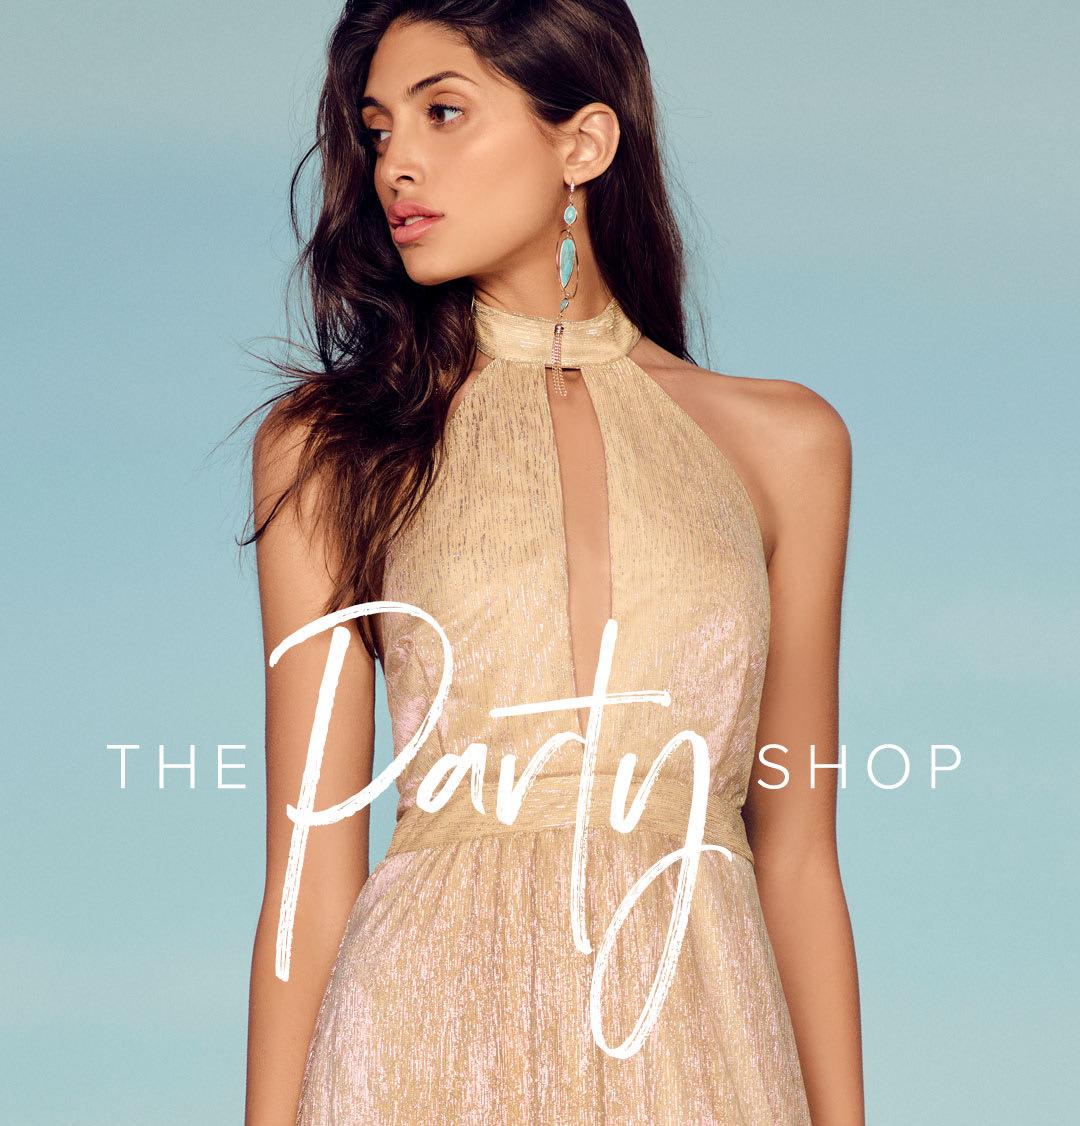 The Party Shop- Shop Elegant Formal Dresses, Evening Dresses, Party Dresses, Bodycon Dresses, and Gowns.